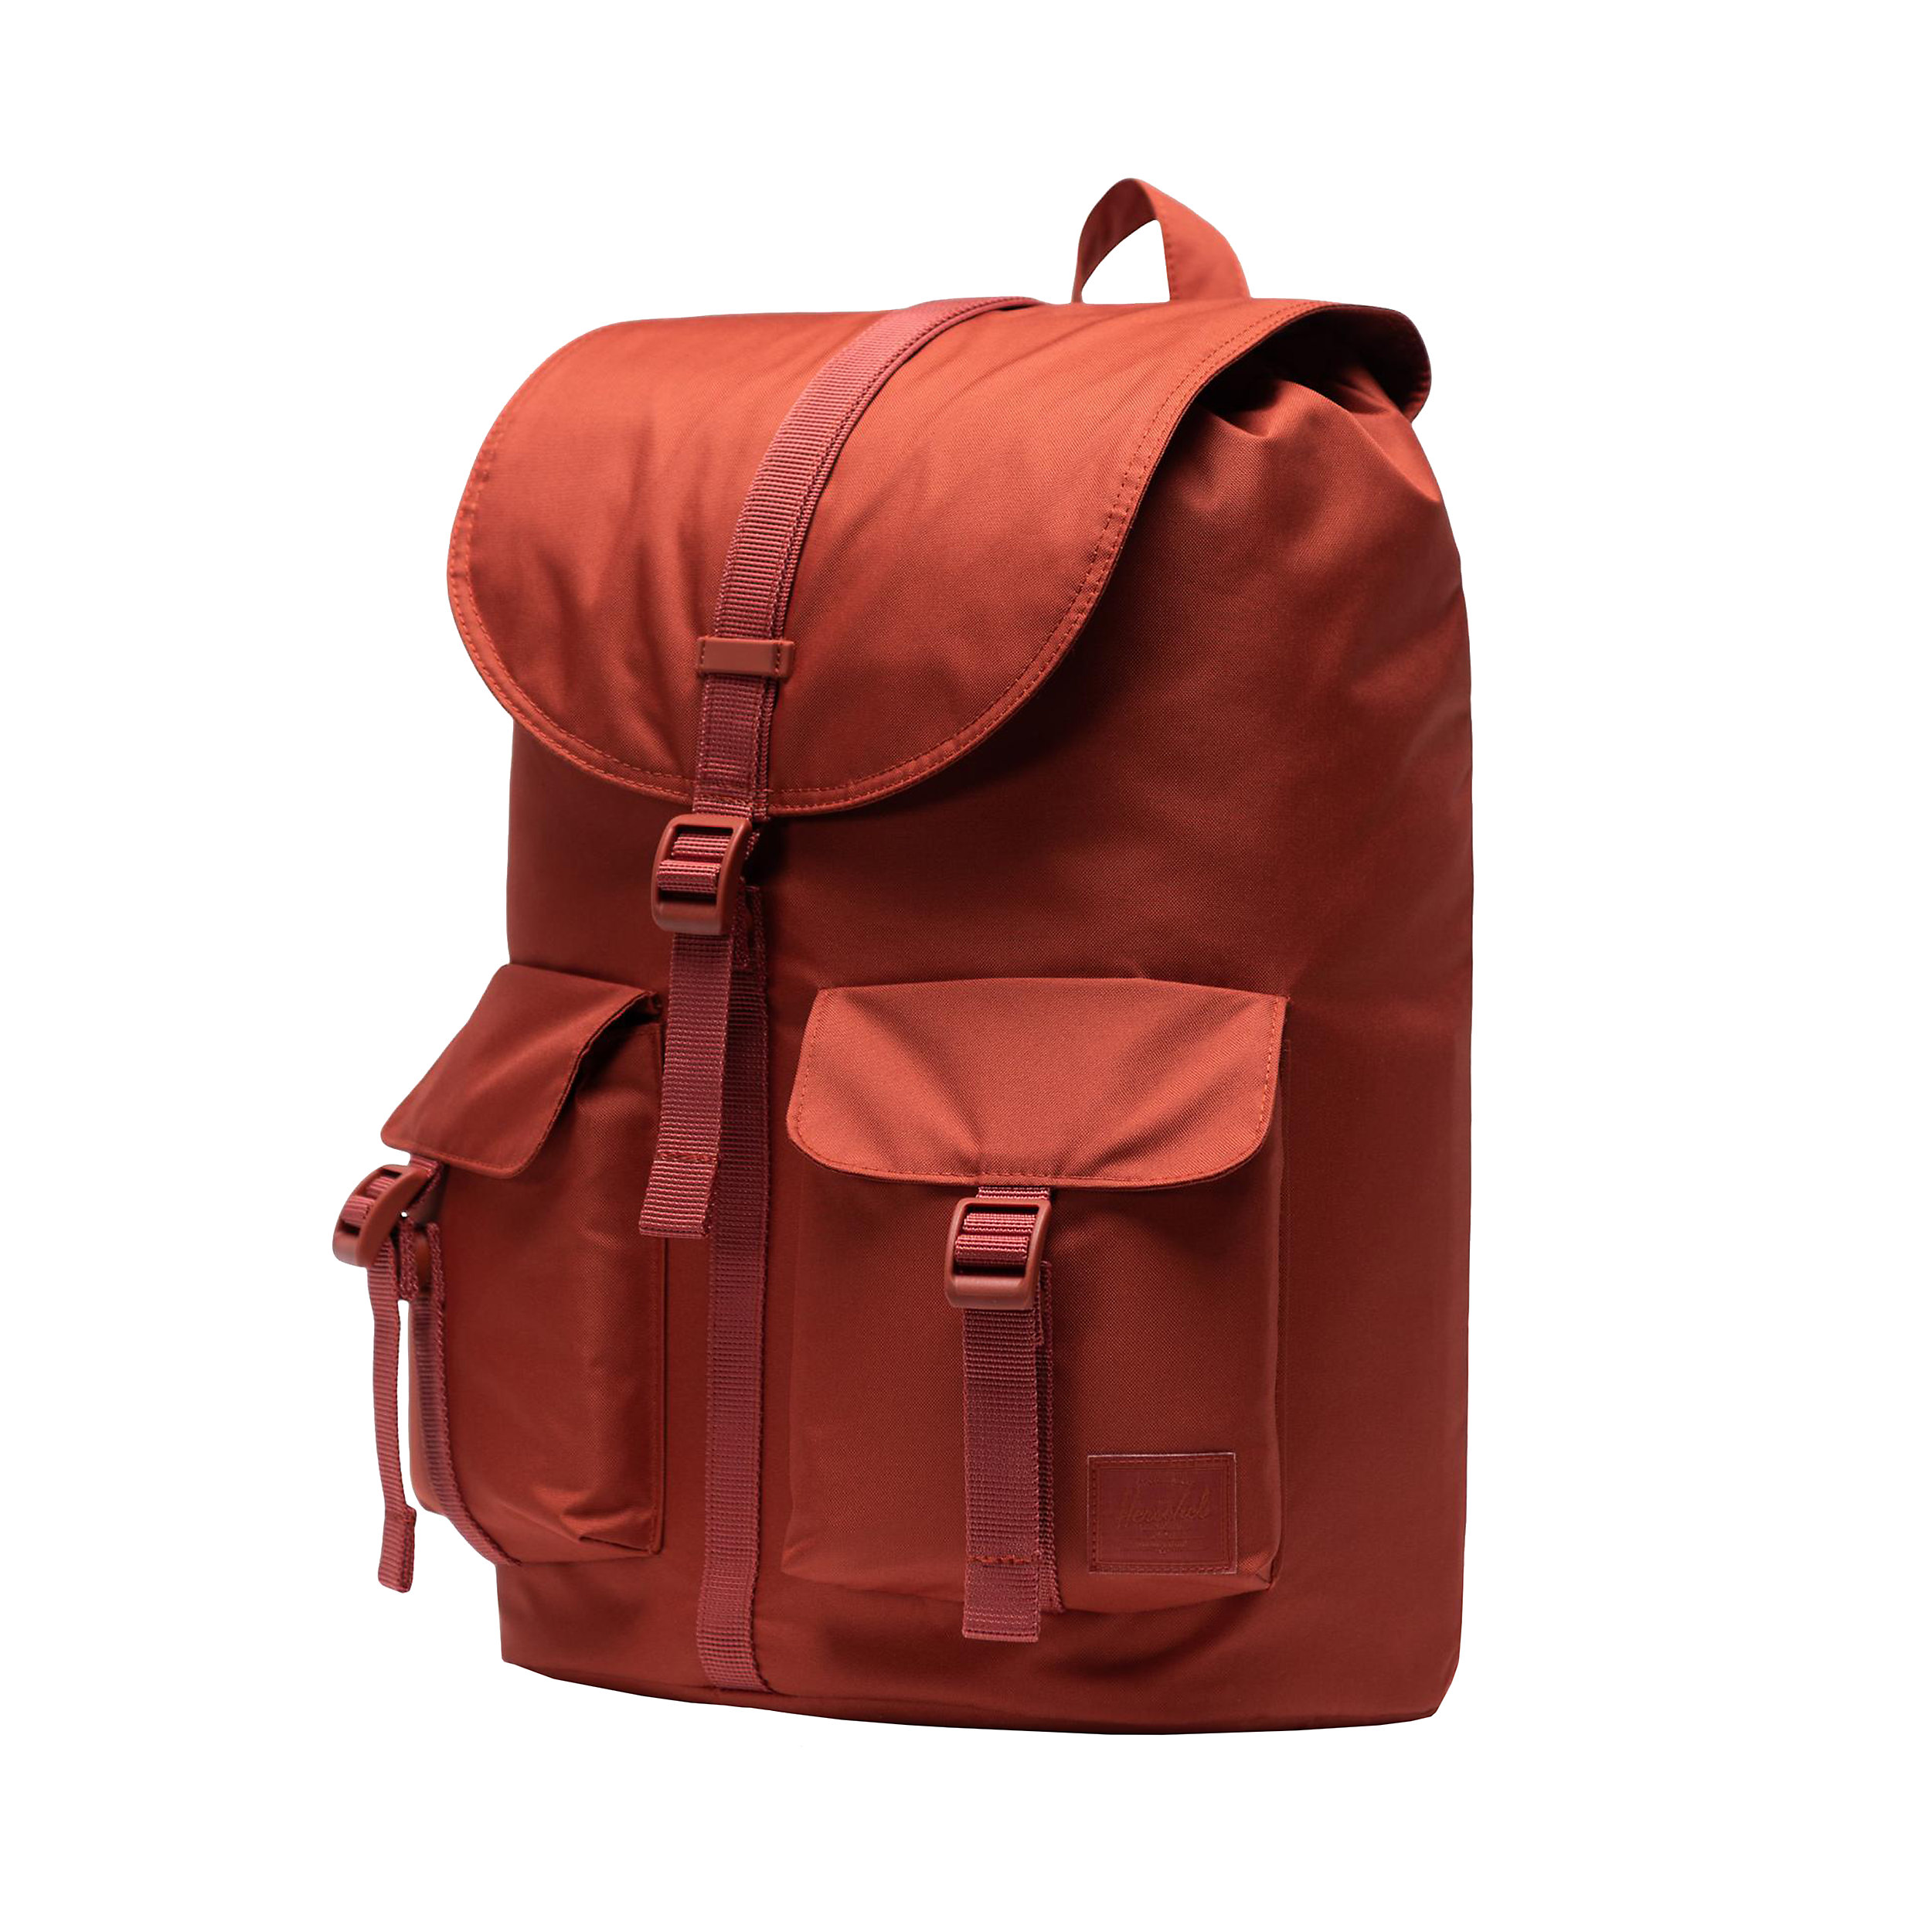 "Backpack Dawson Light 13"" Classic Light 20.5 Liter"